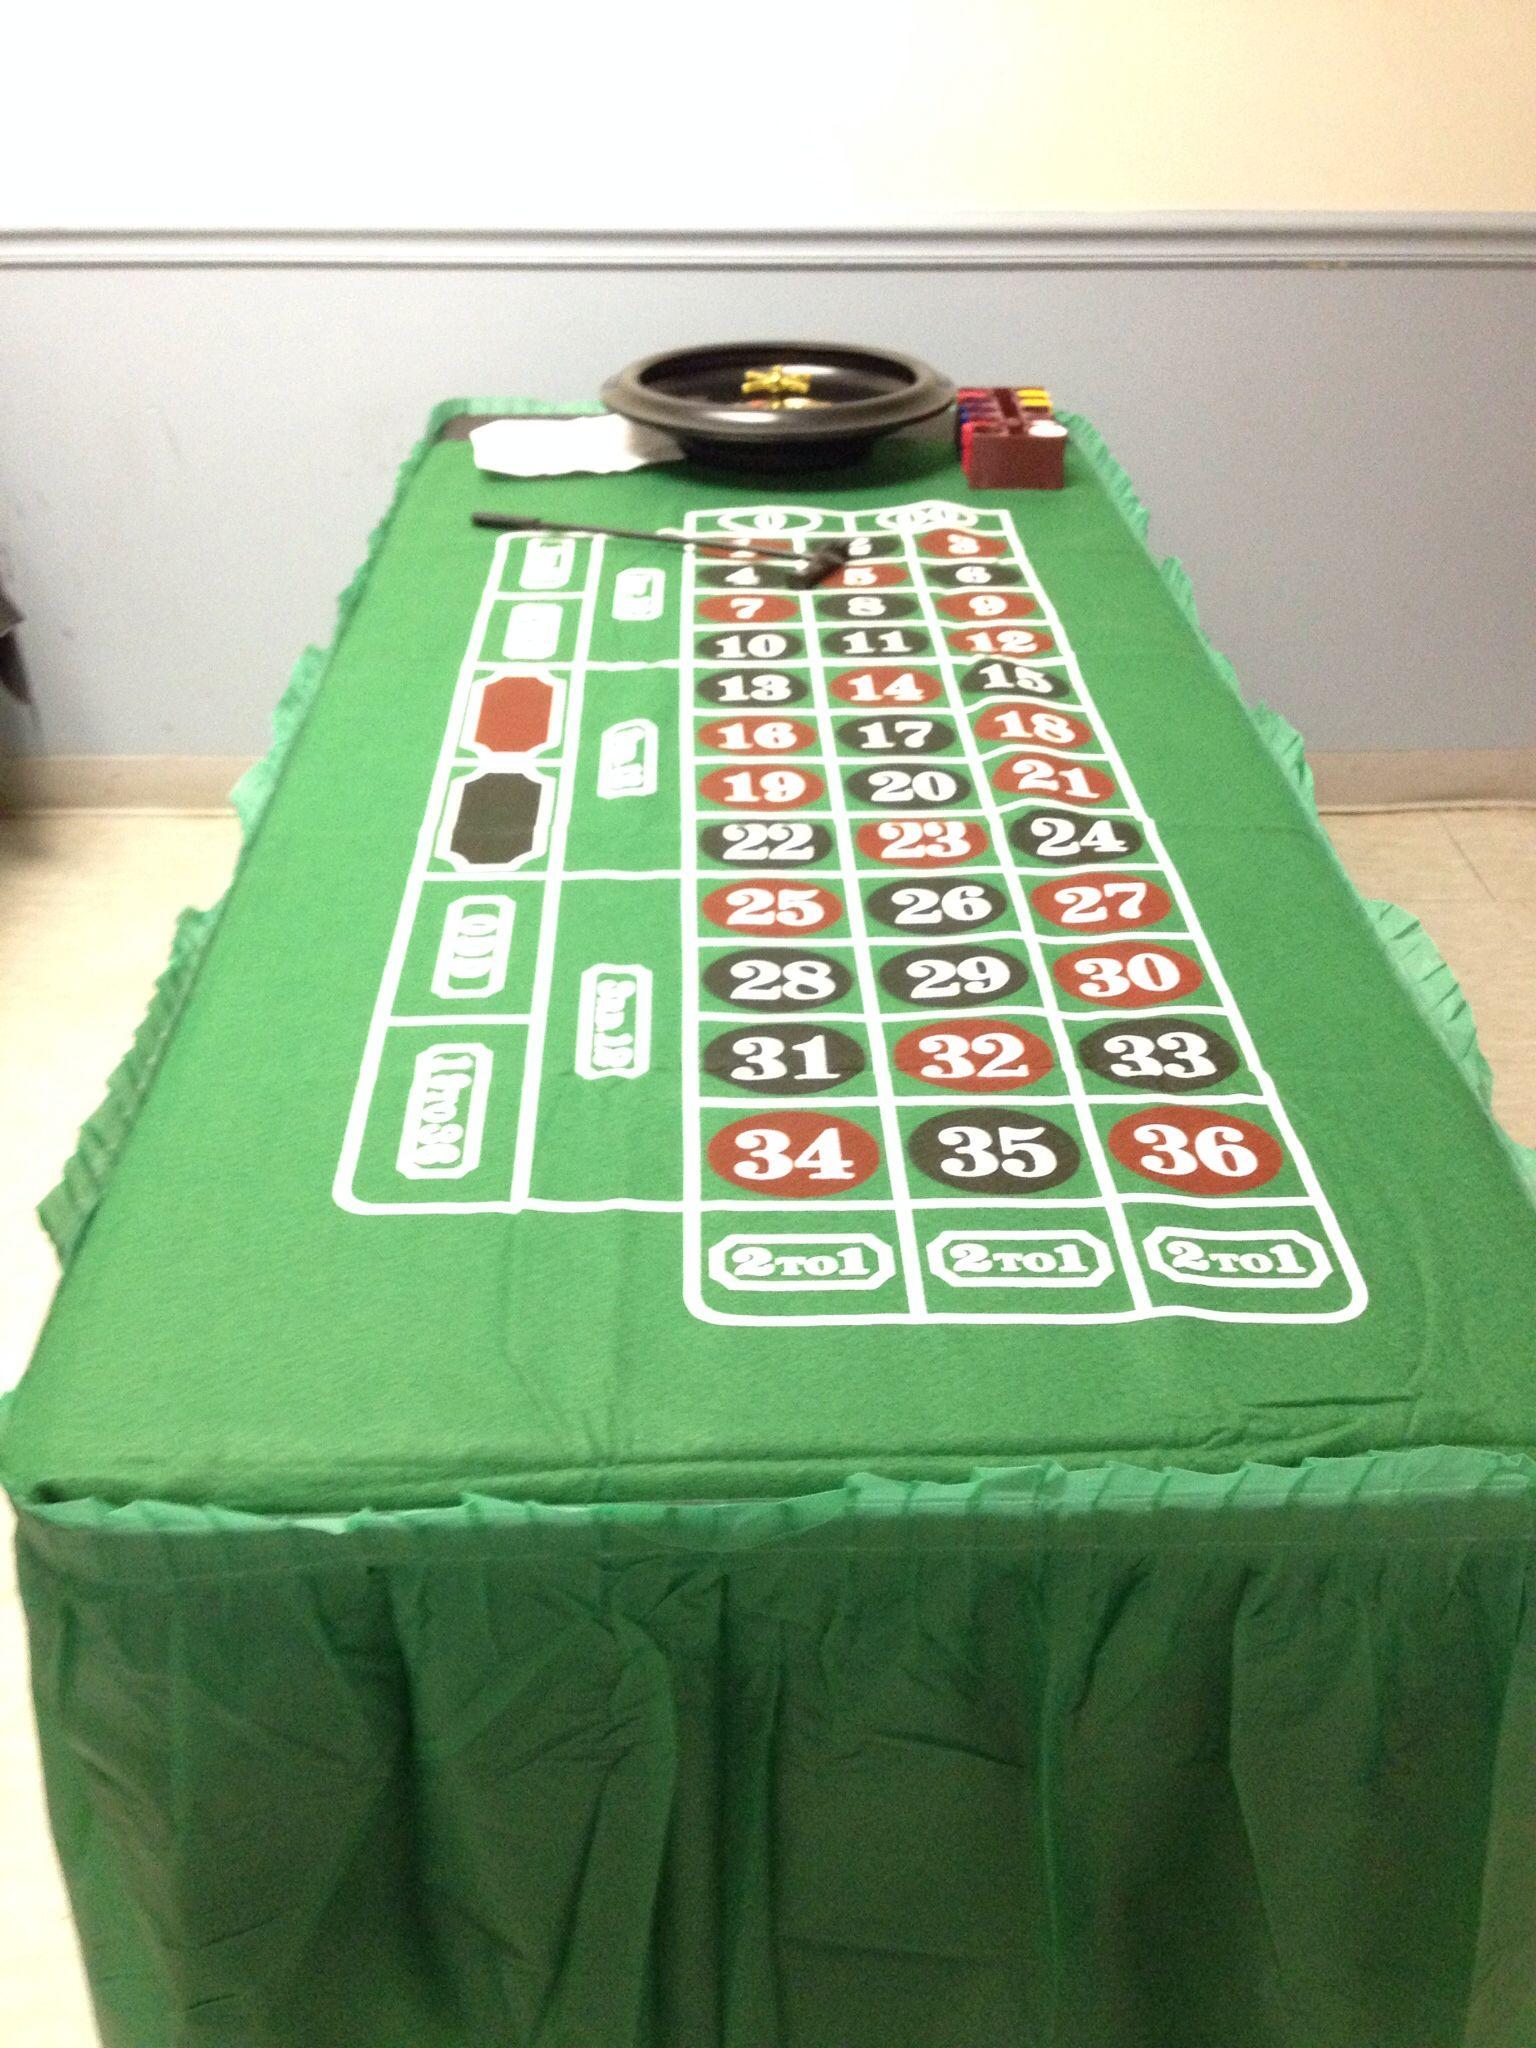 Homemade casino games forex is not gambling